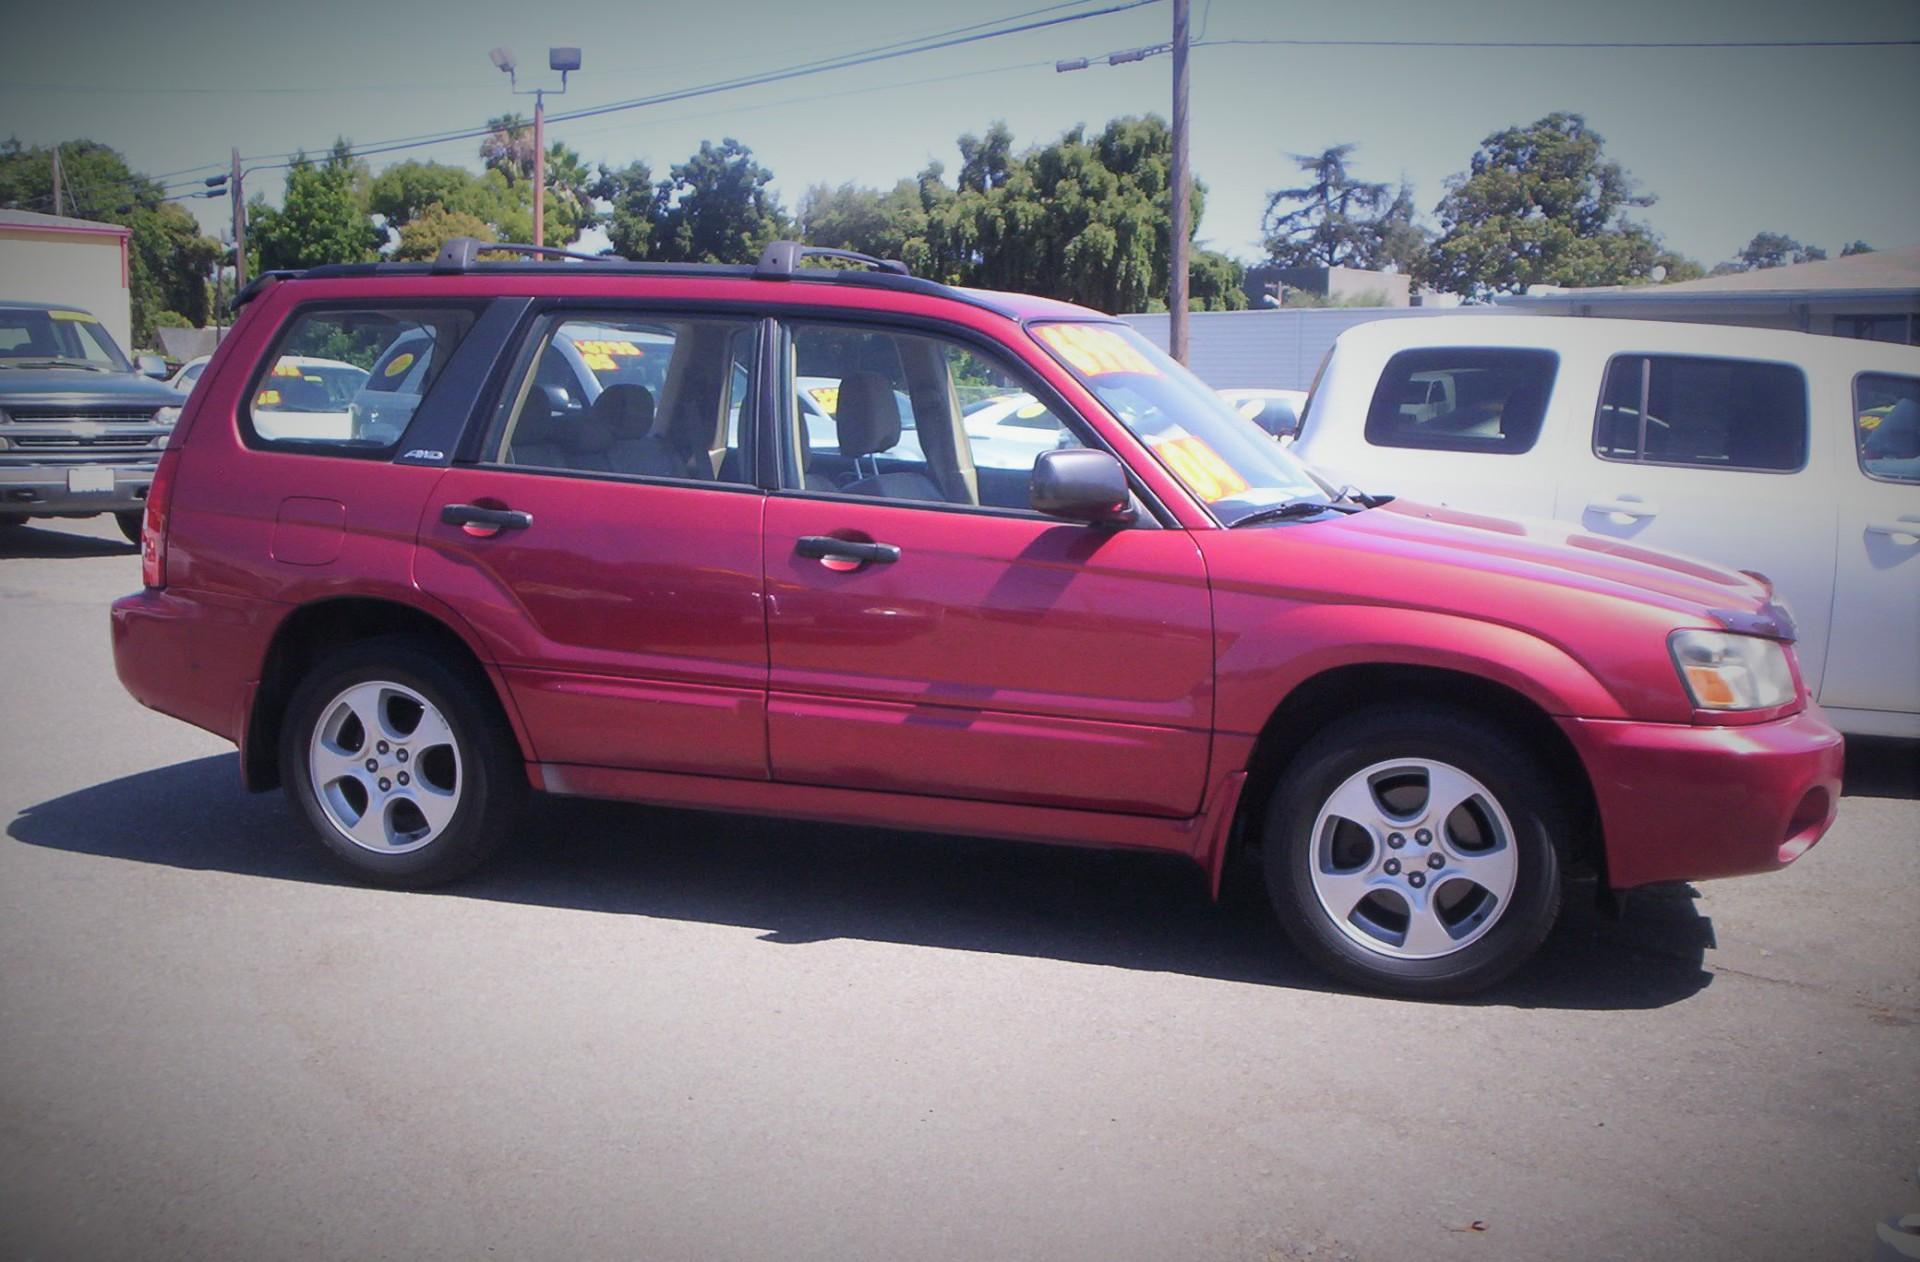 2004 Subaru Forester - $6,995